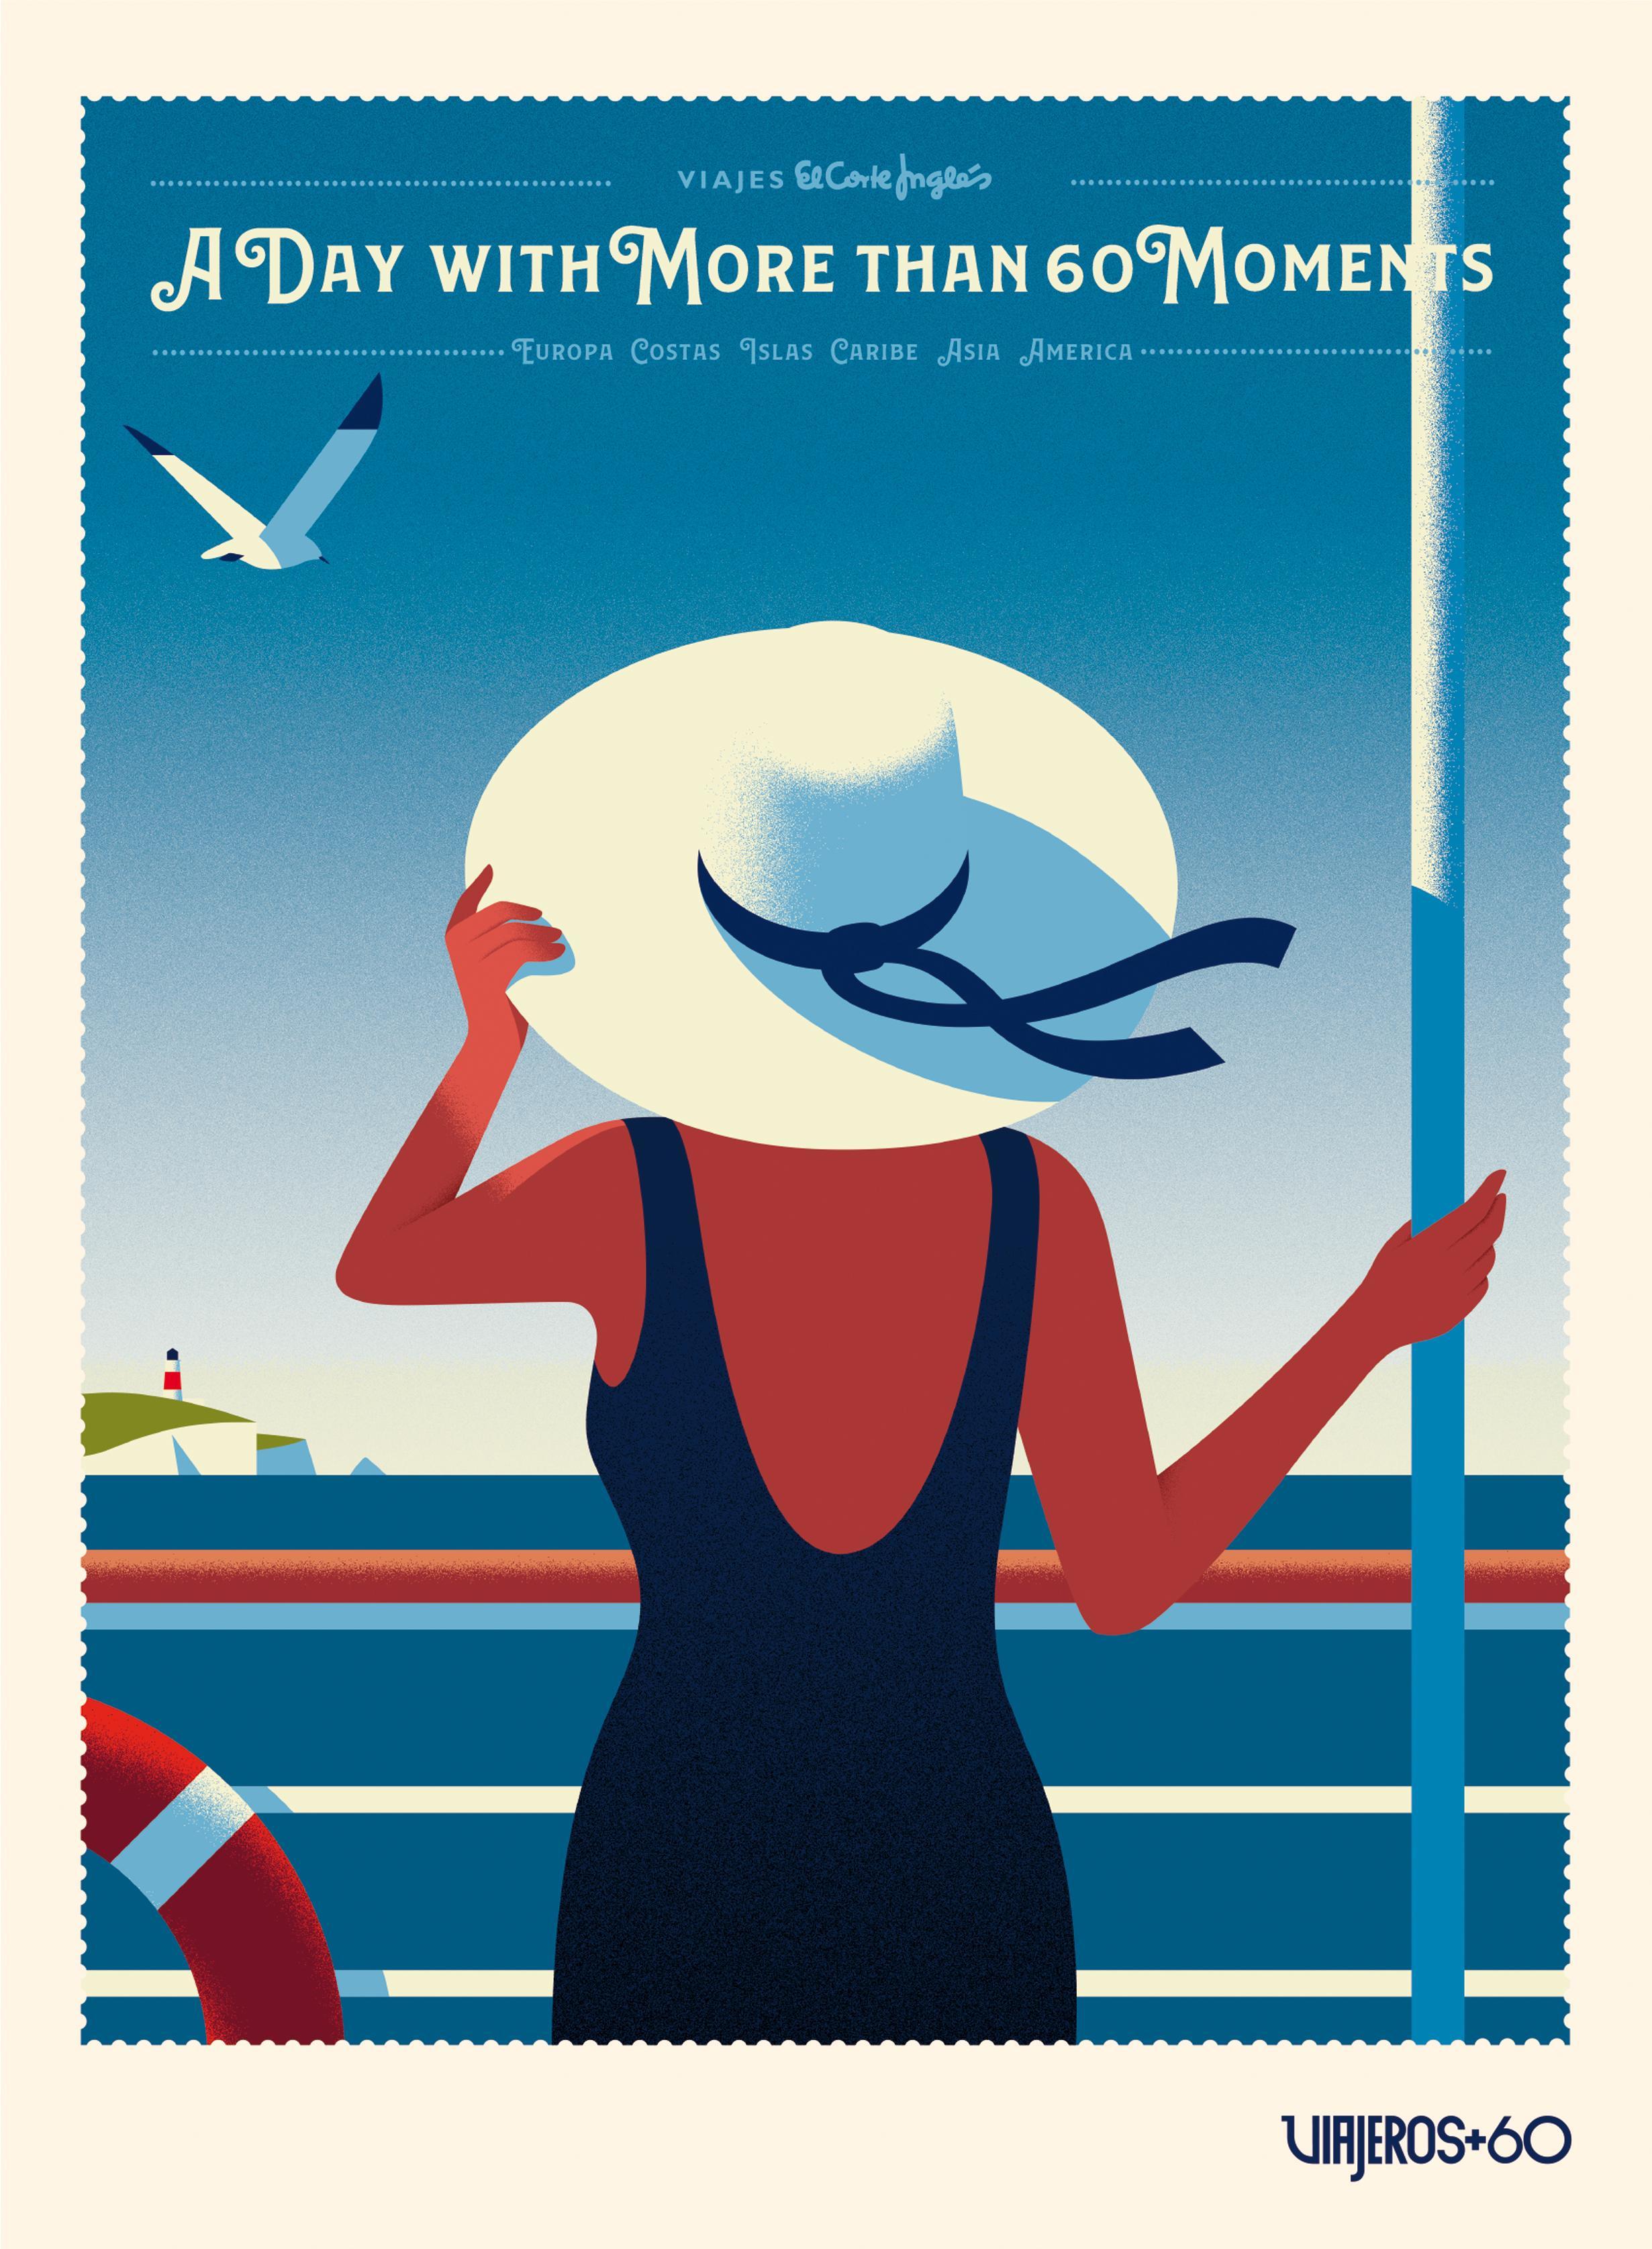 Viajes el Corte Ingles Print Ad - VIAJEROS +60, Cruises